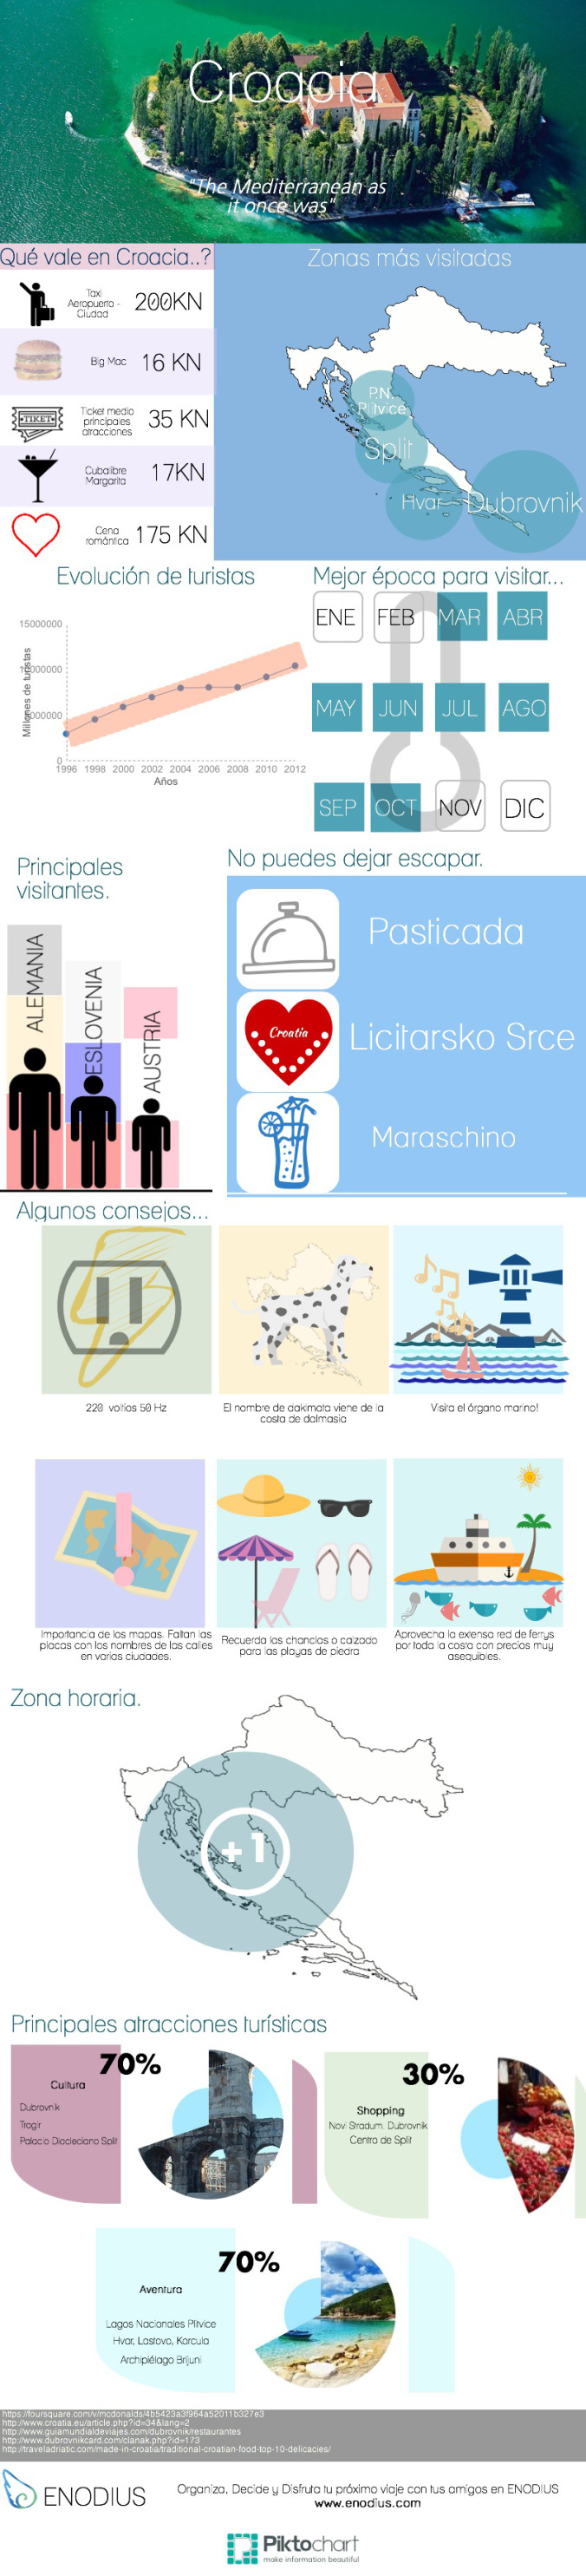 Un recorrido por Croacia